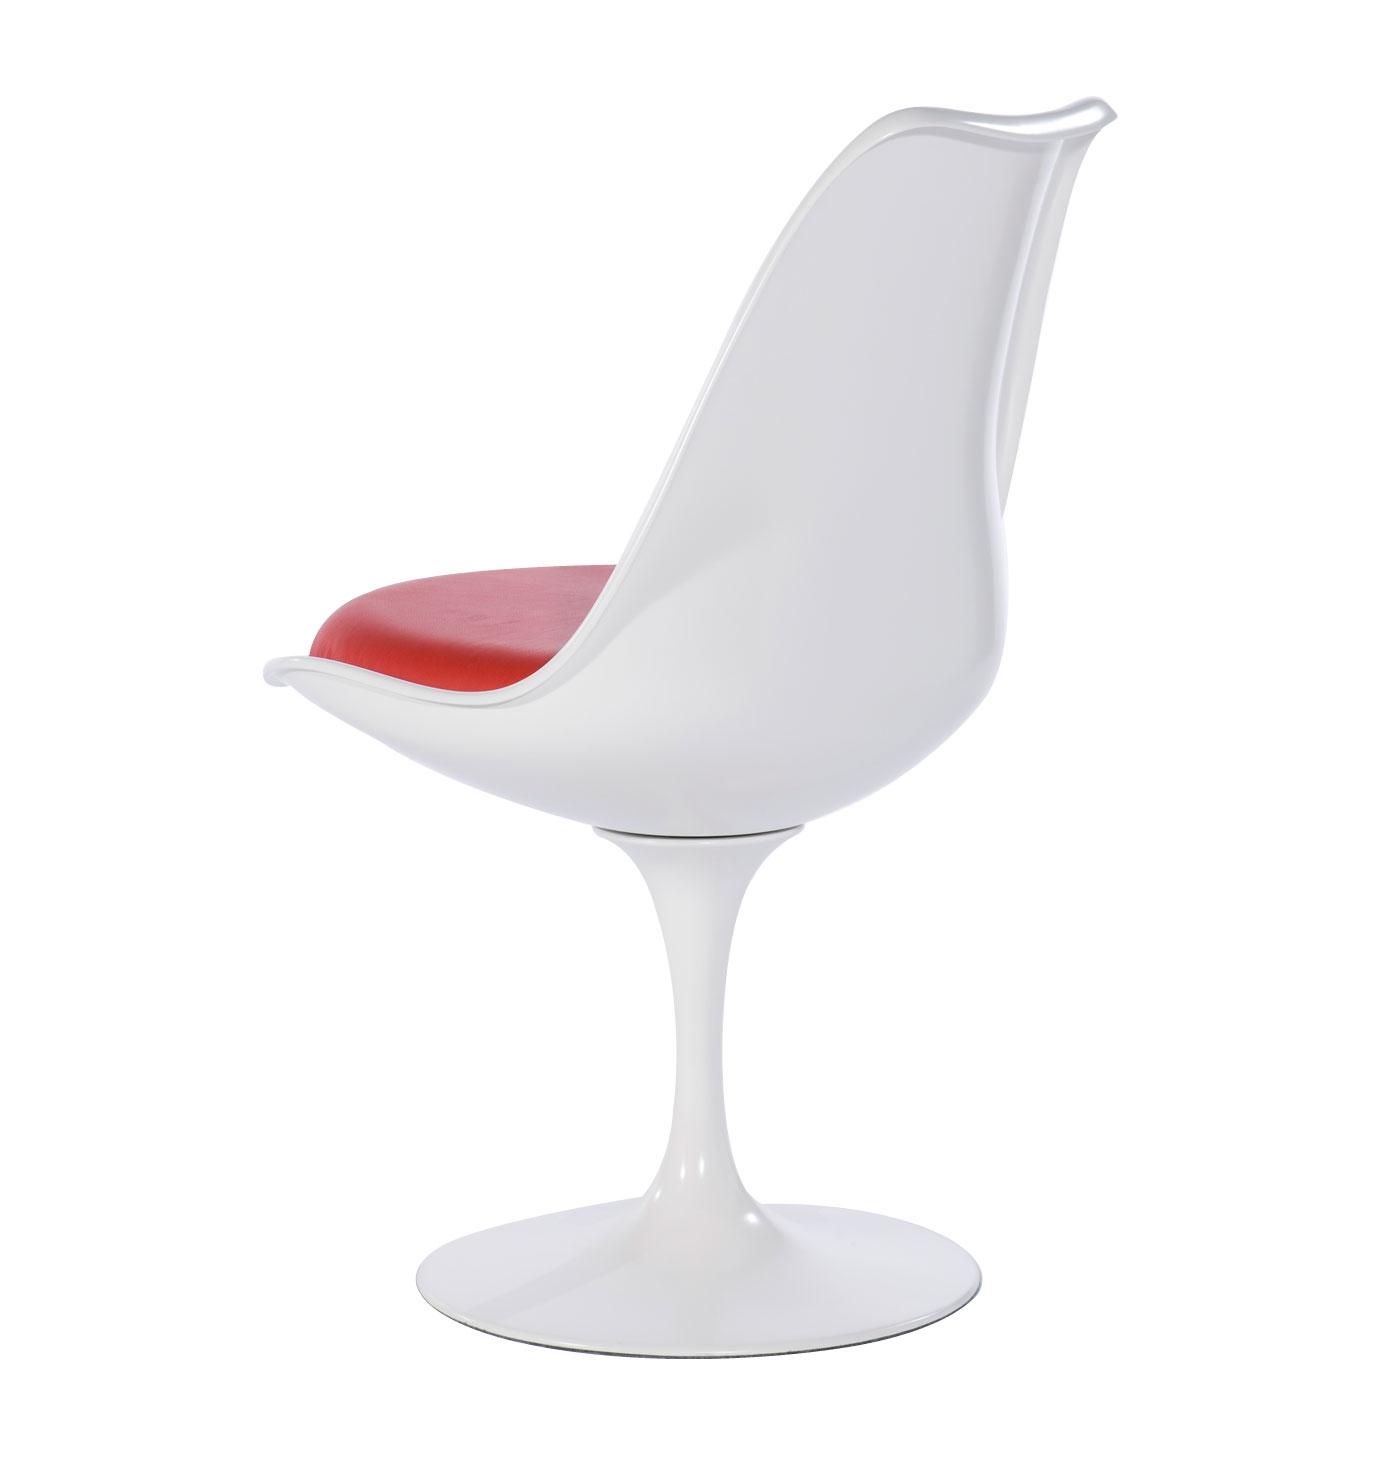 Replica eero saarinen tulip chair sedia sedie tavoli e for Replica sedie design